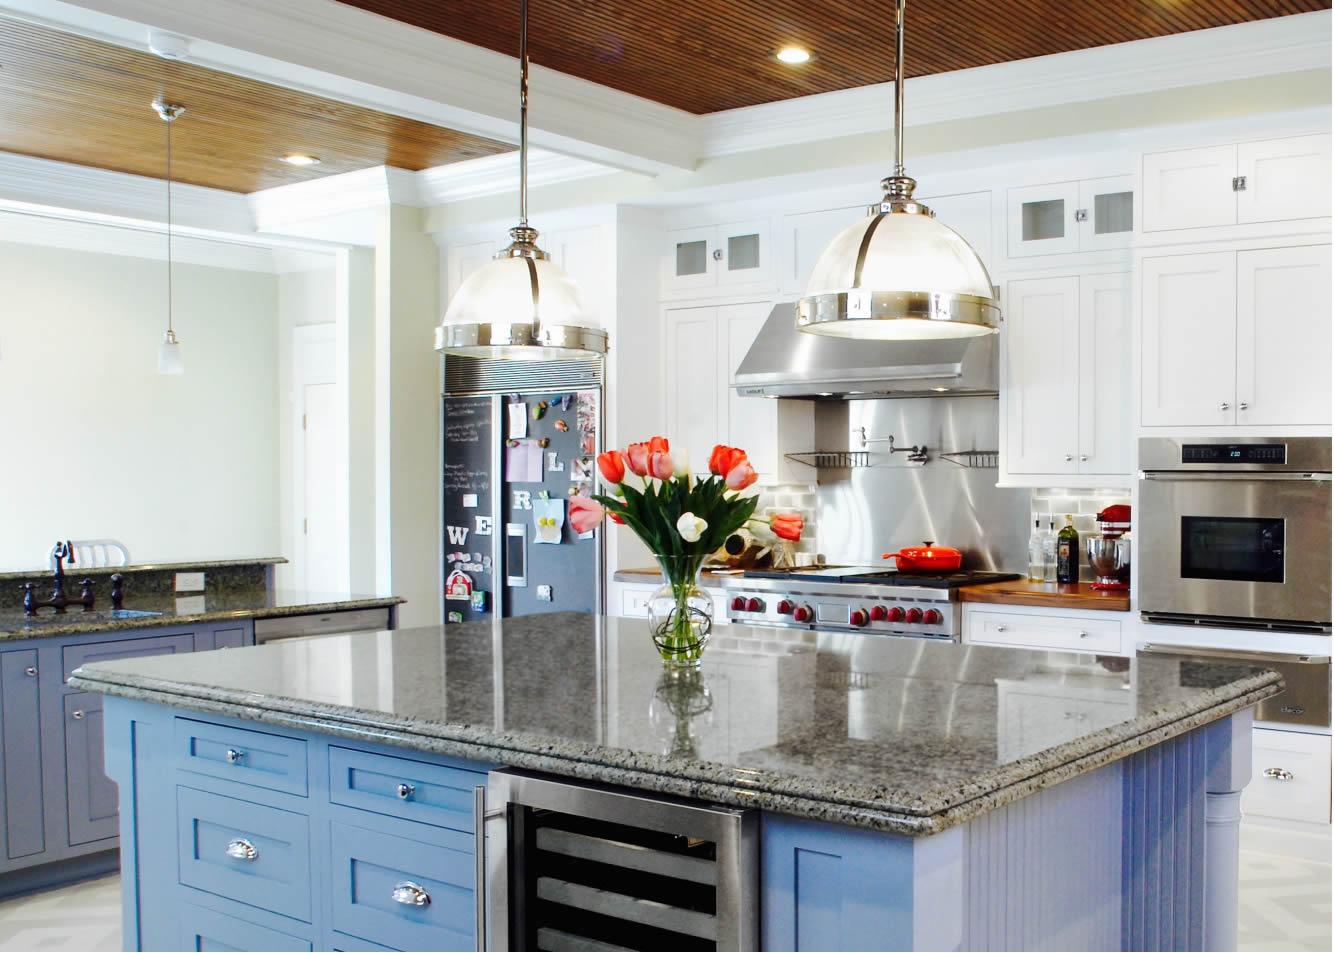 the jamestown kitchen – cks design studio